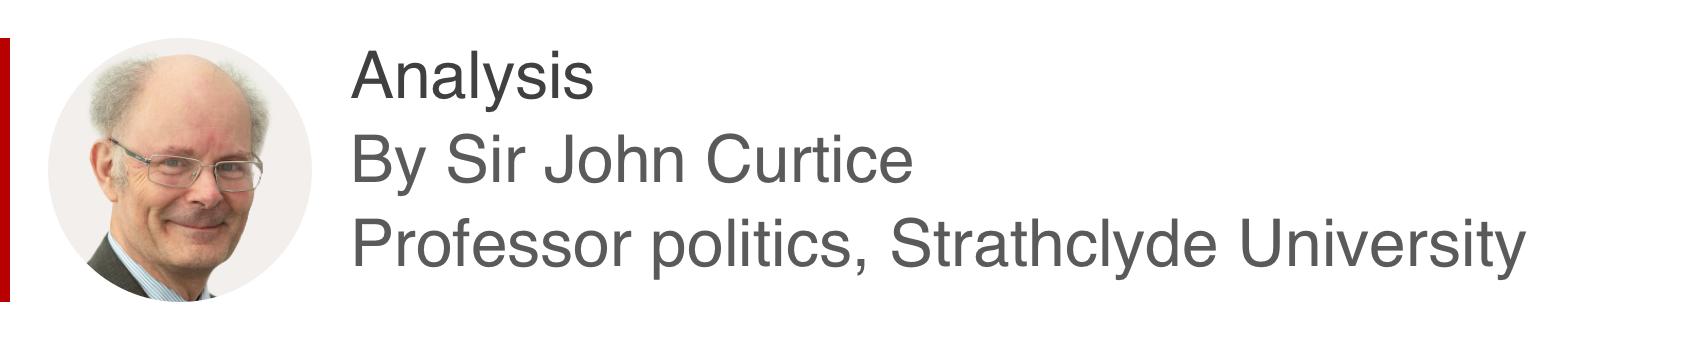 Analysis box by Sir John Curtice, professor politics, Strathclyde University